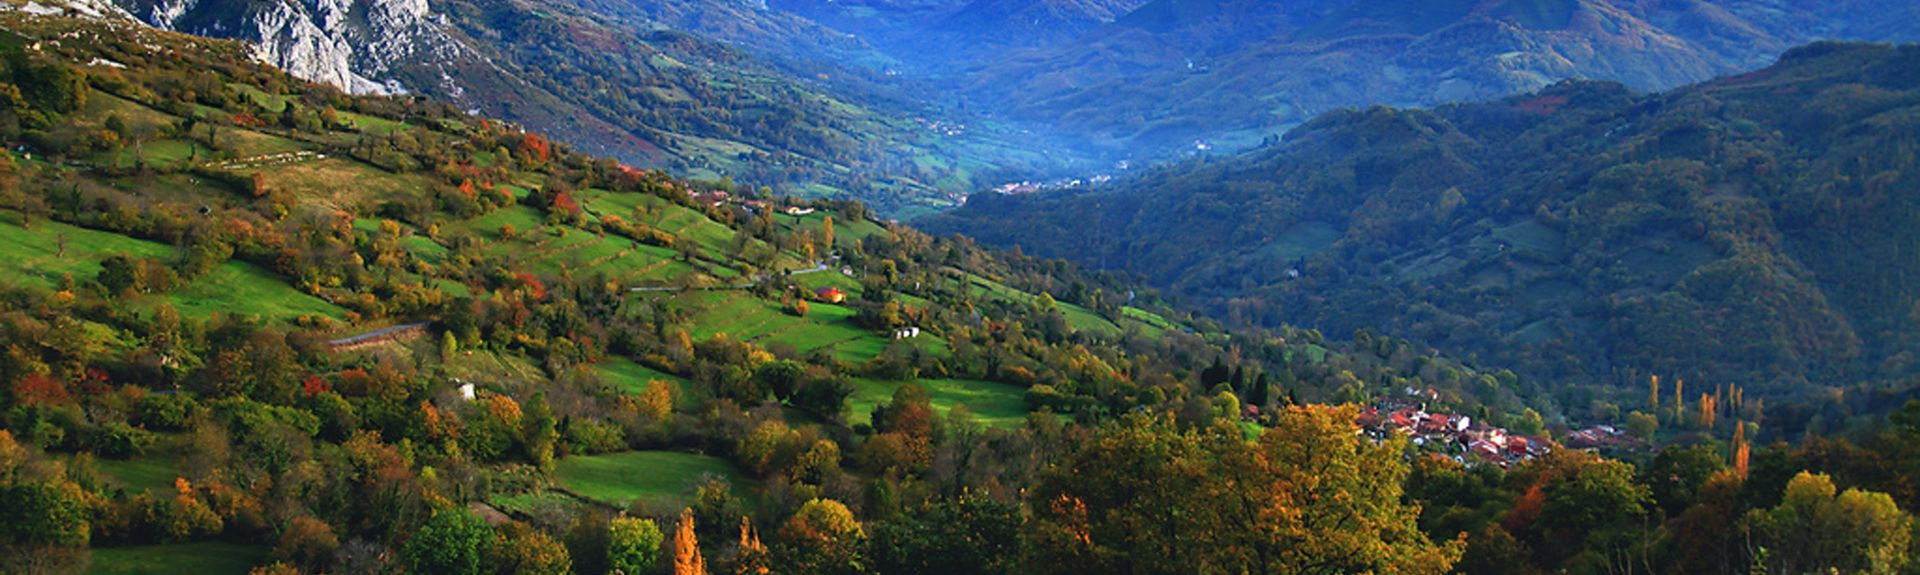 Grado, Asturias, Spain